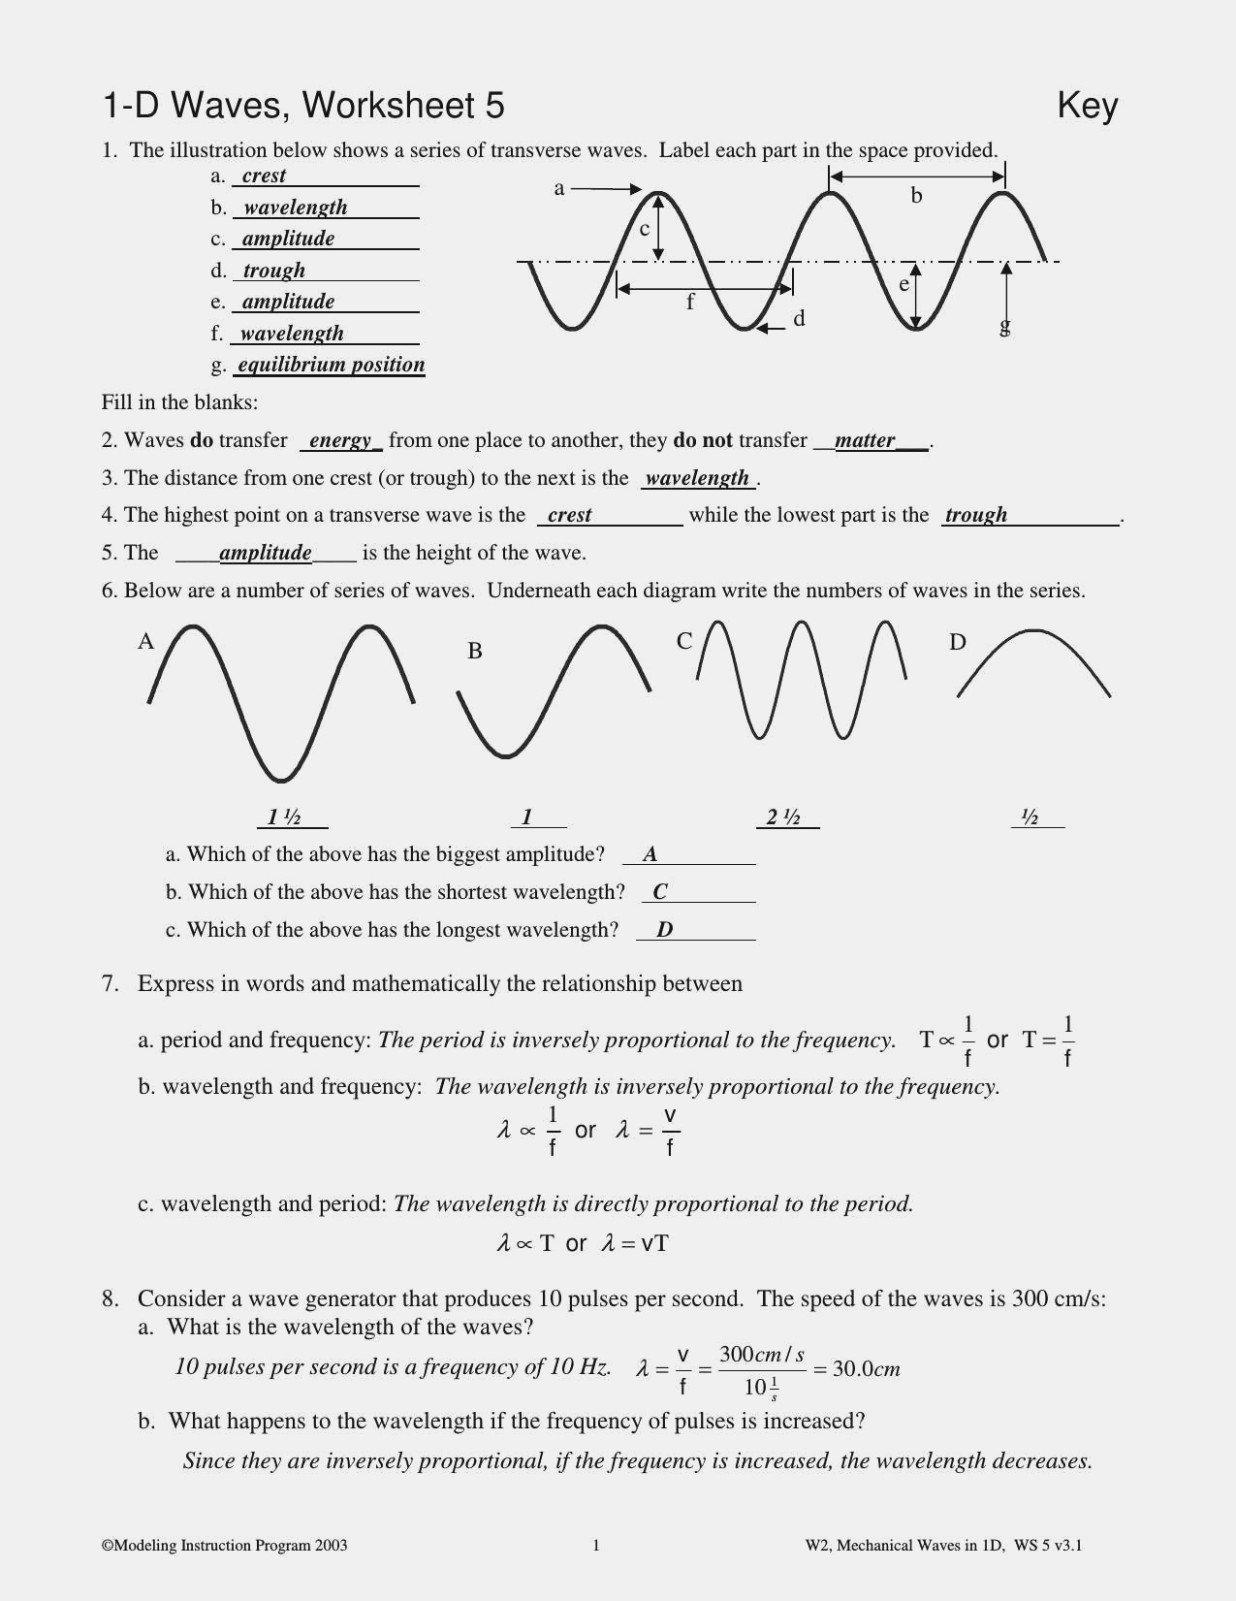 Worksheet Labeling Waves Answer Key